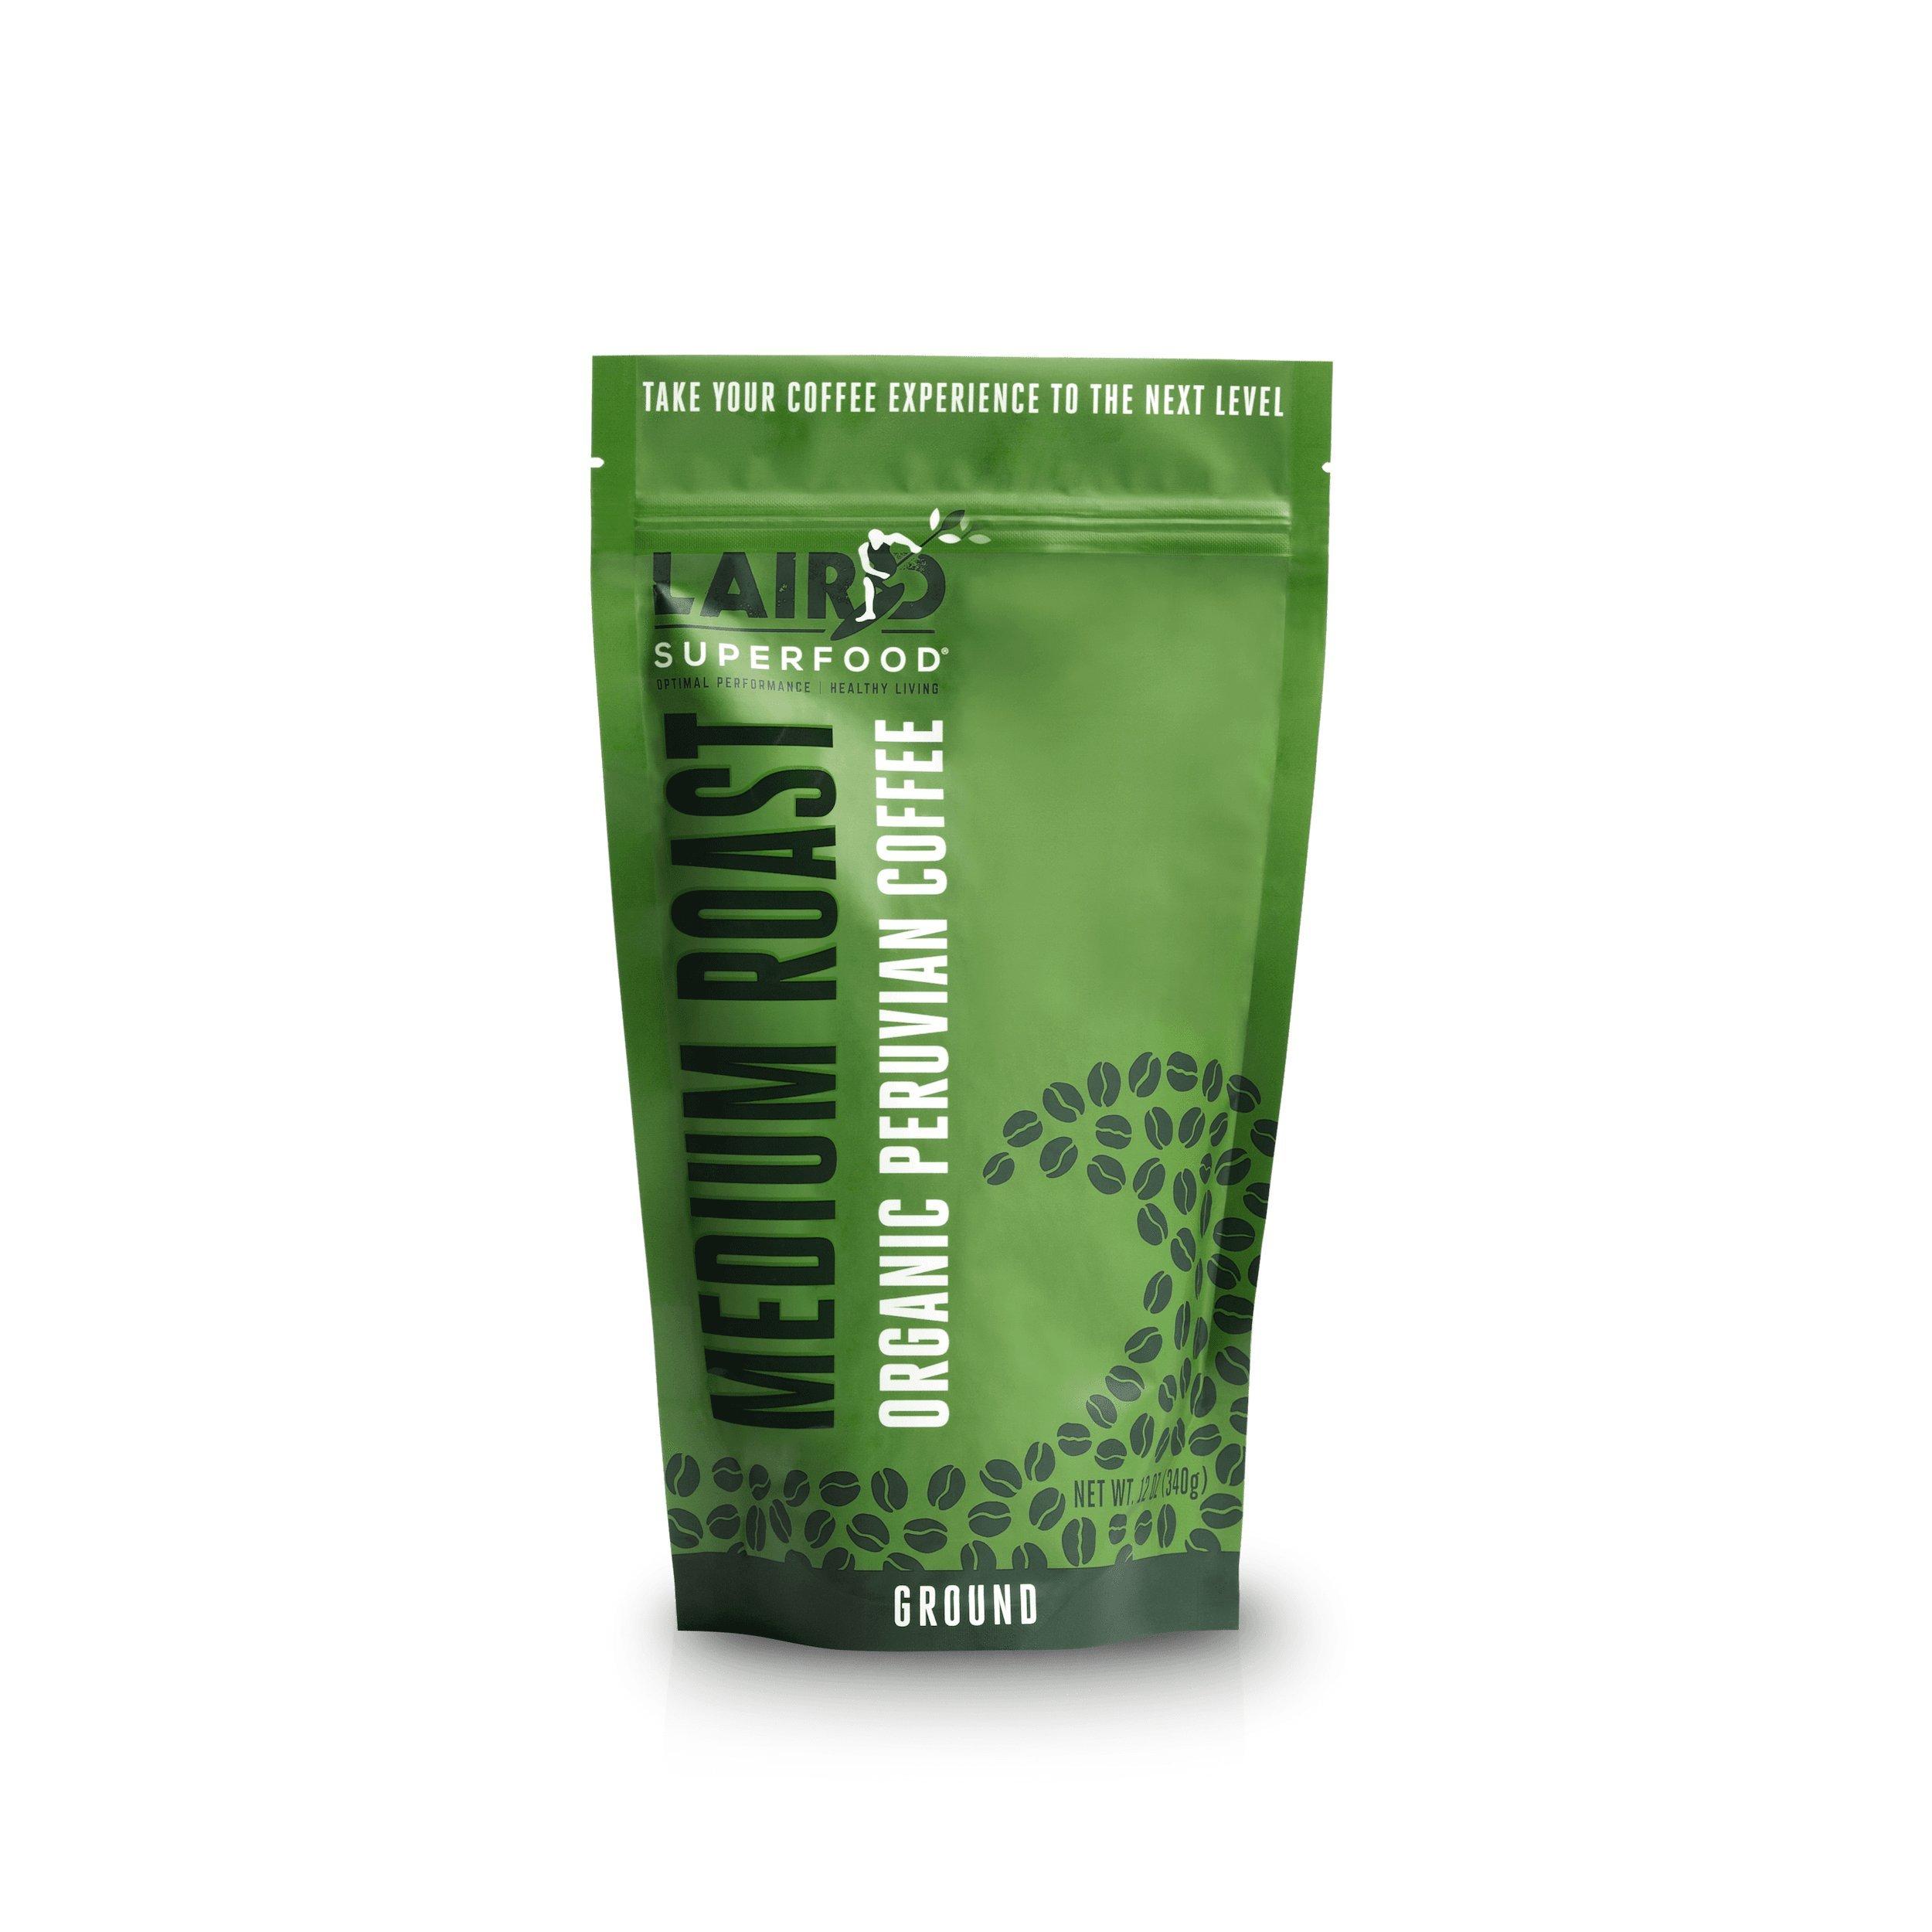 Laird Superfood Organic Ground Coffee   Medium Roast   Certified Fair Trade   Hand-Picked   Slow Roasted Beans - 12 oz Bag